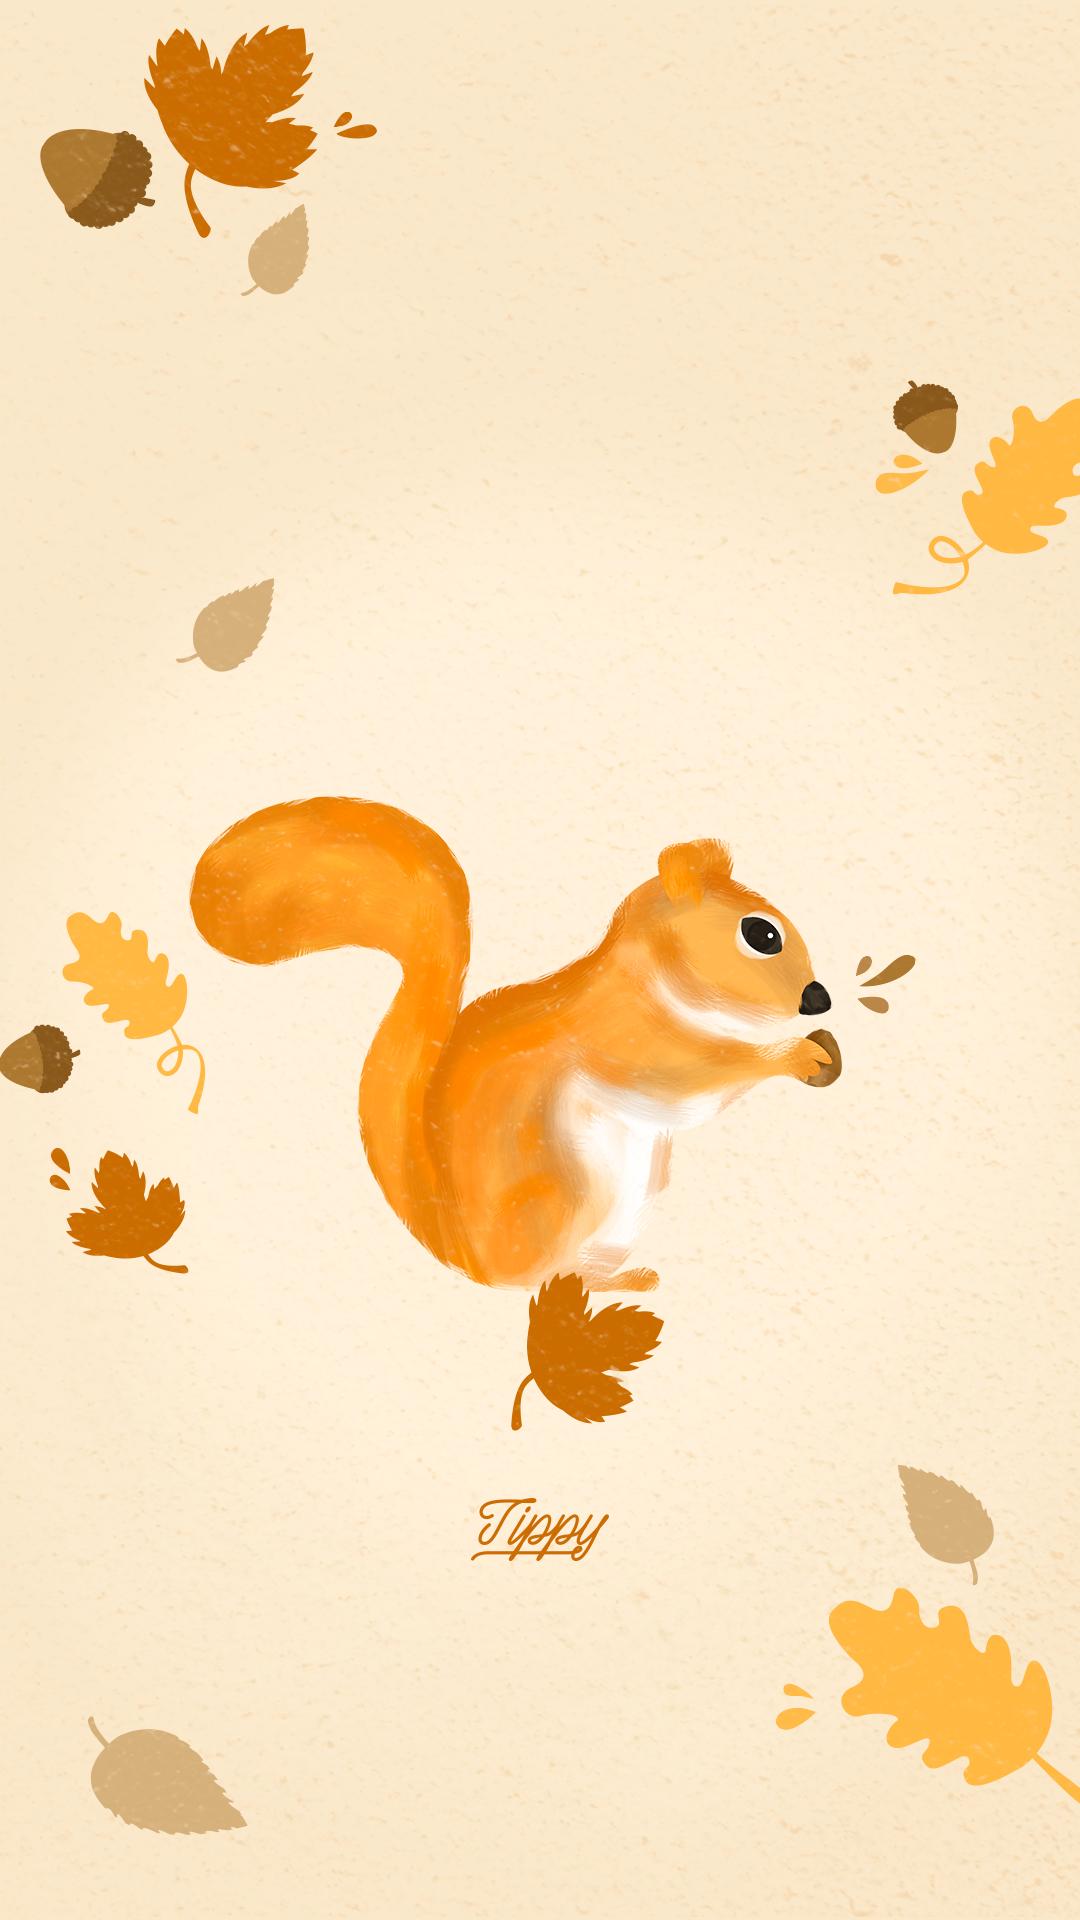 Autumn iPhone Wallpaper Lock Screen @PanPins | iPhone ...